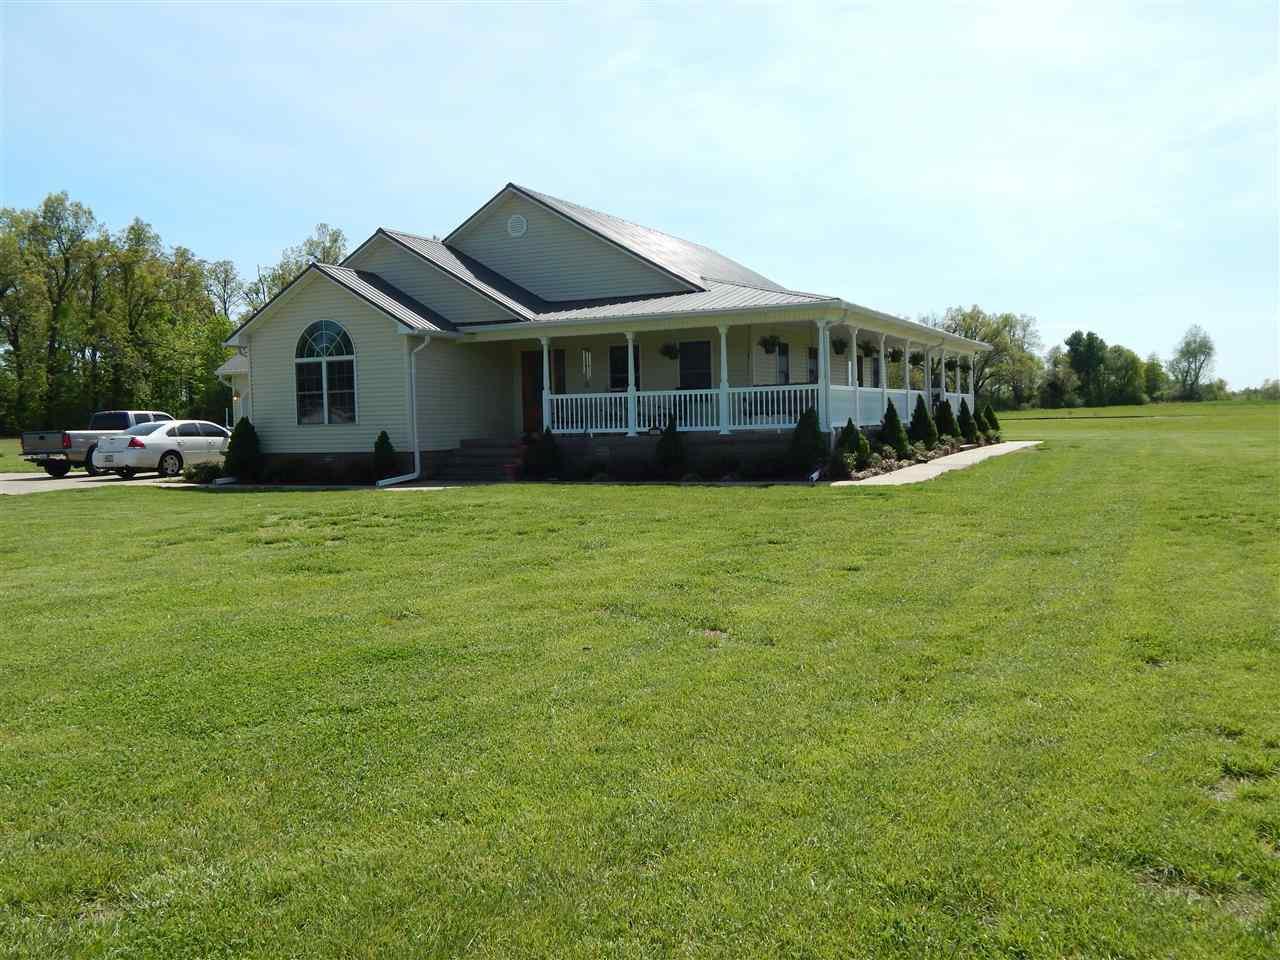 Real Estate for Sale, ListingId: 29408736, Almo,KY42020